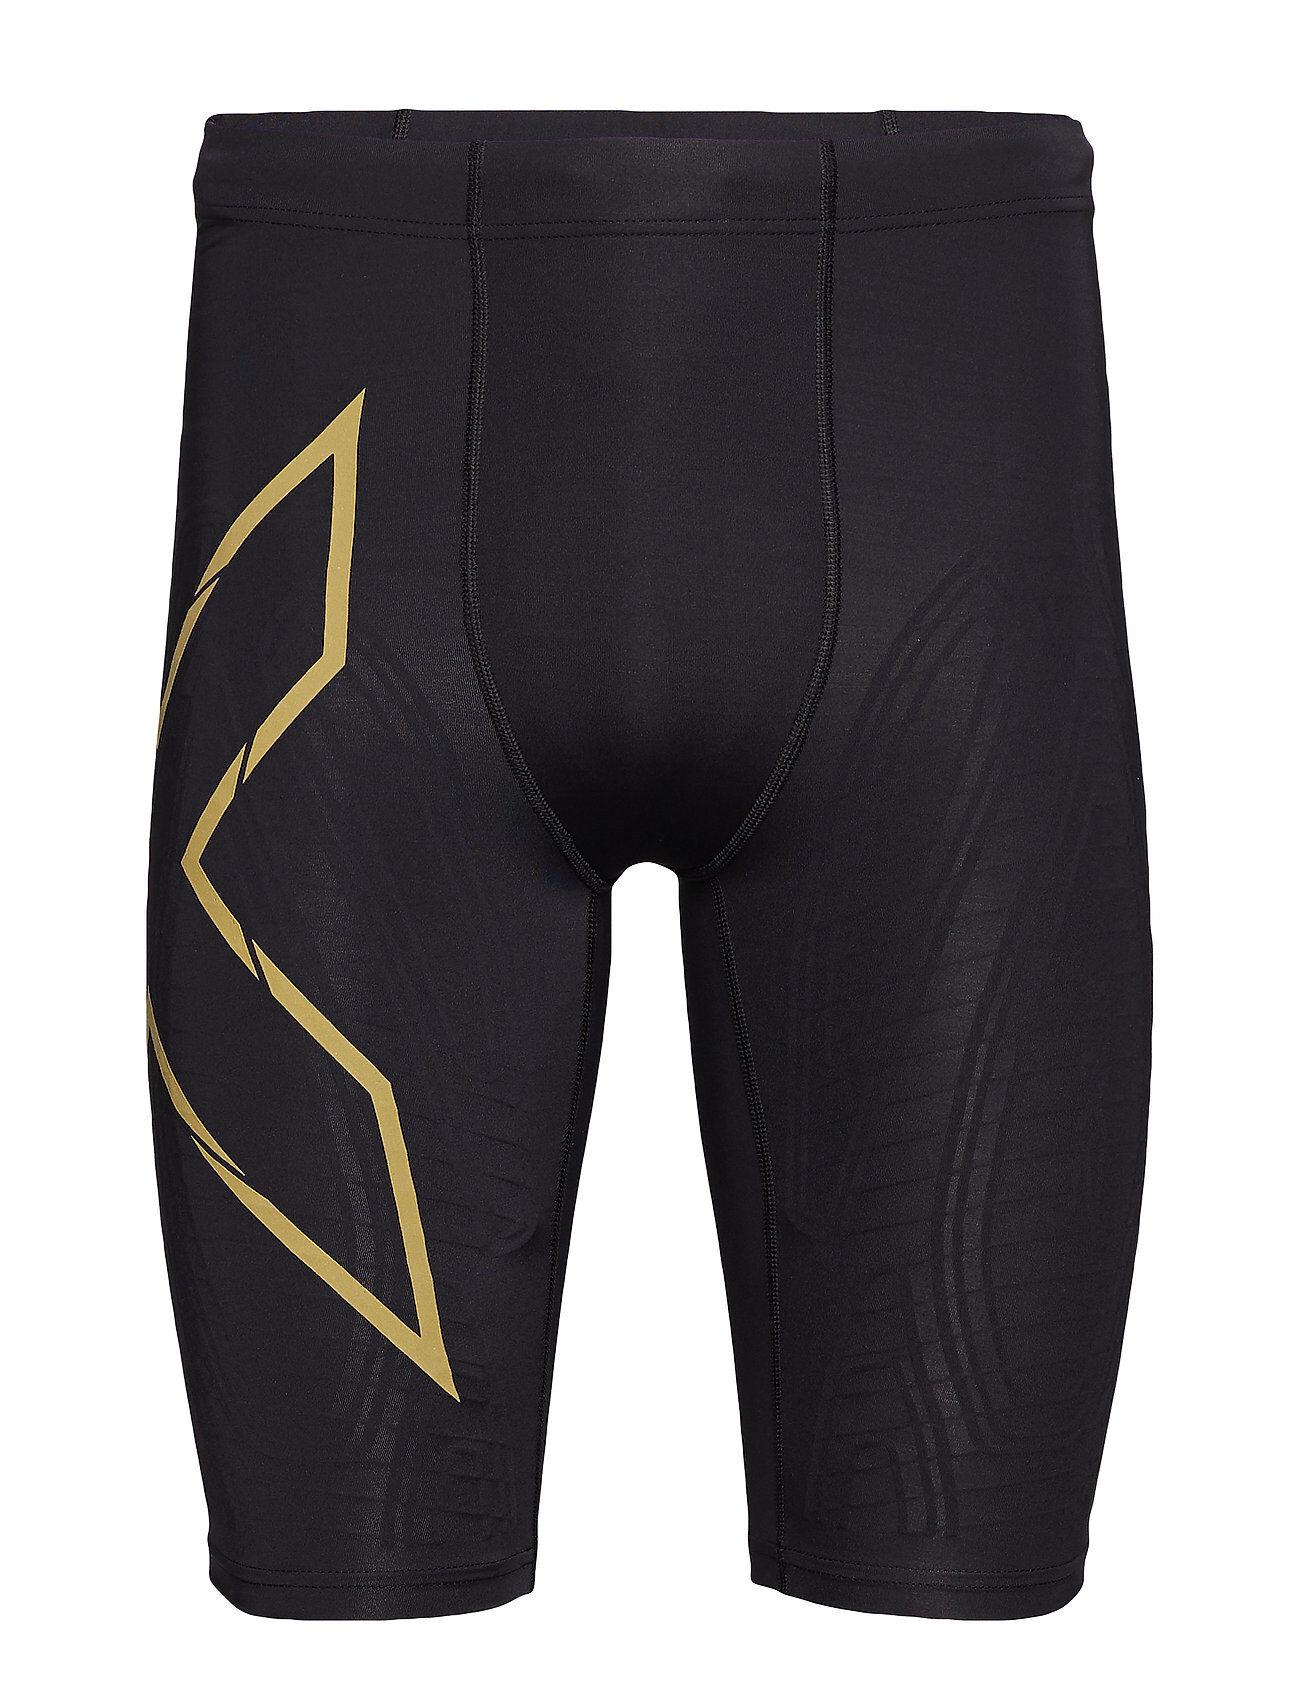 Image of 2XU Mcs Run Compression Shorts-M Shorts Sport Shorts Musta 2XU